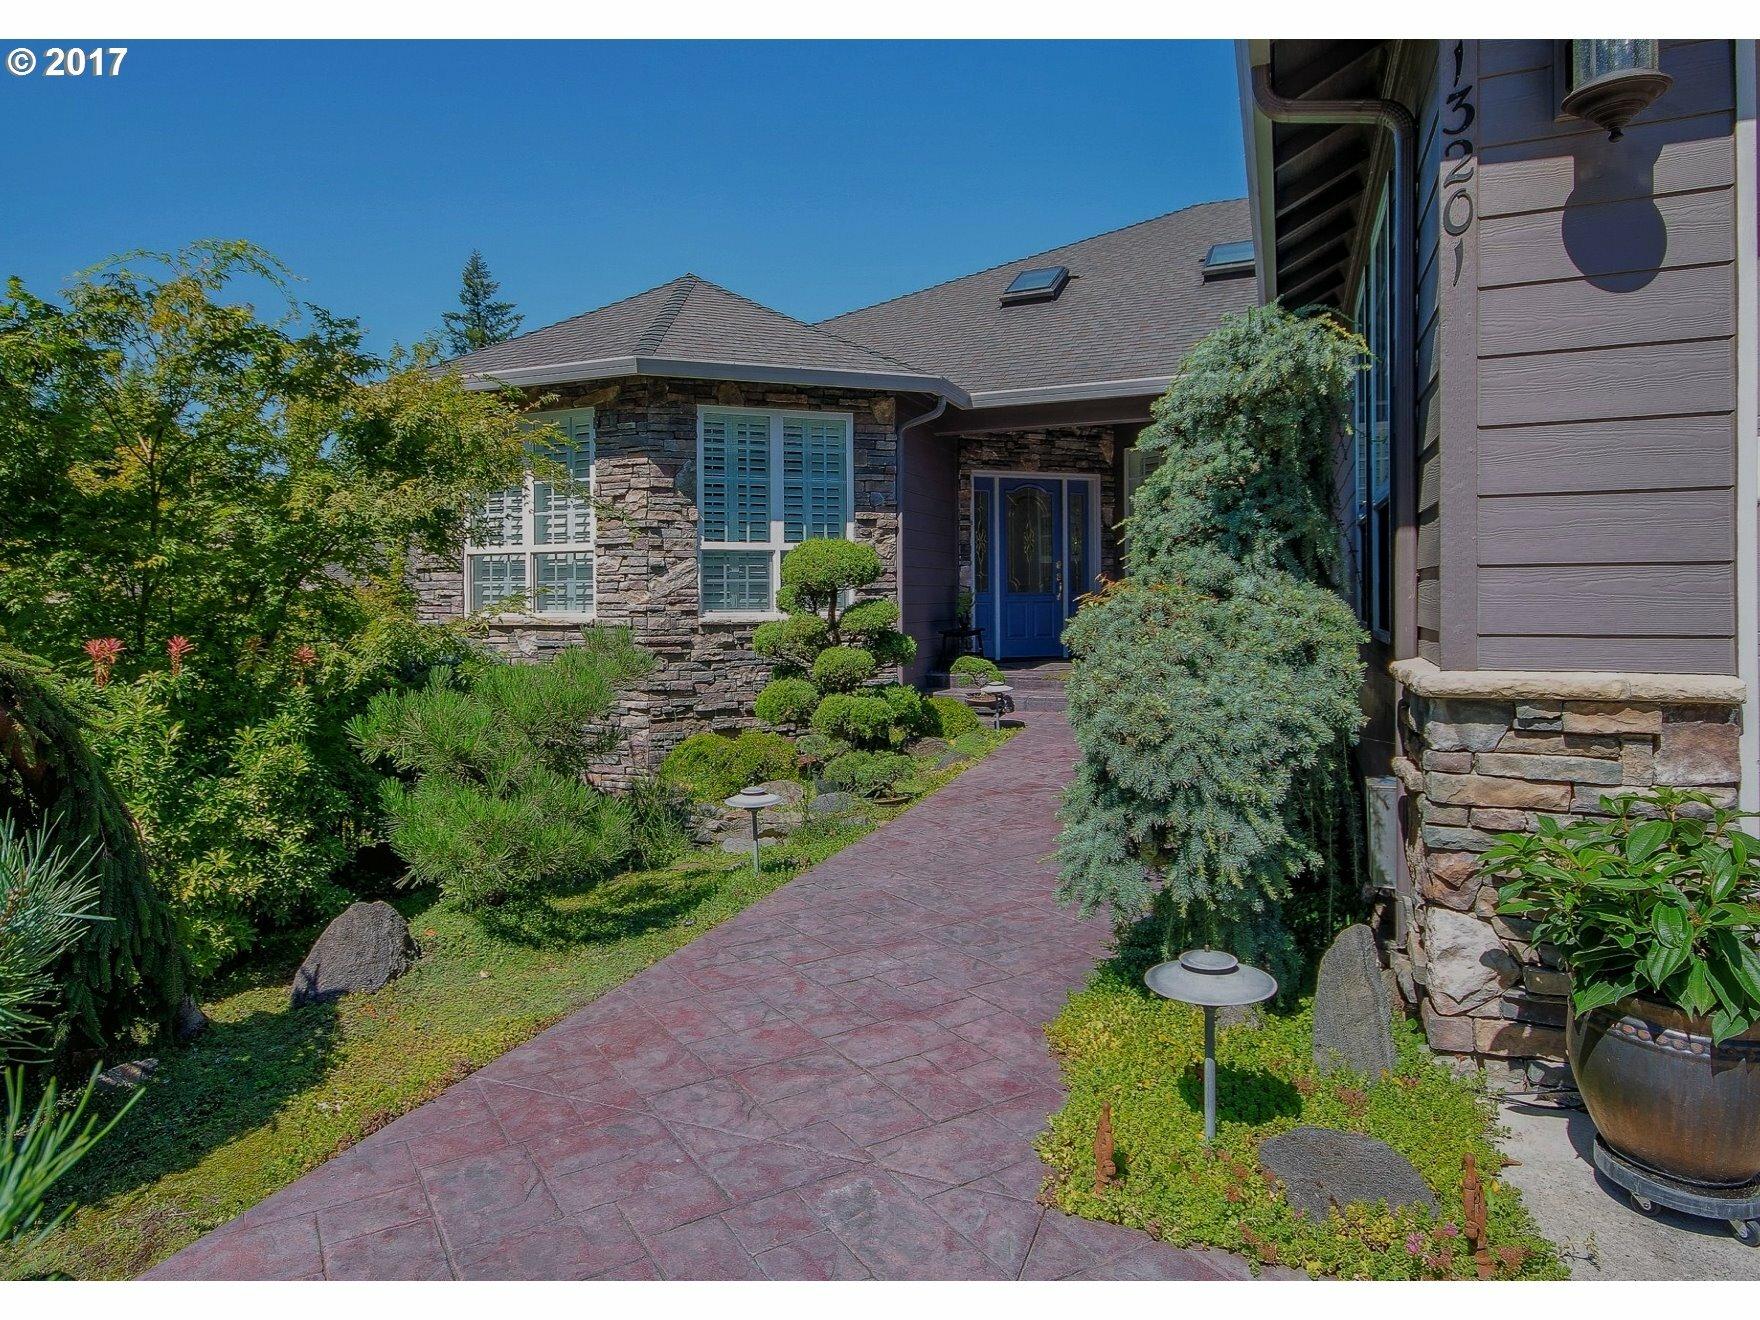 13201 Nw 33rd Ave, Vancouver, WA - USA (photo 2)